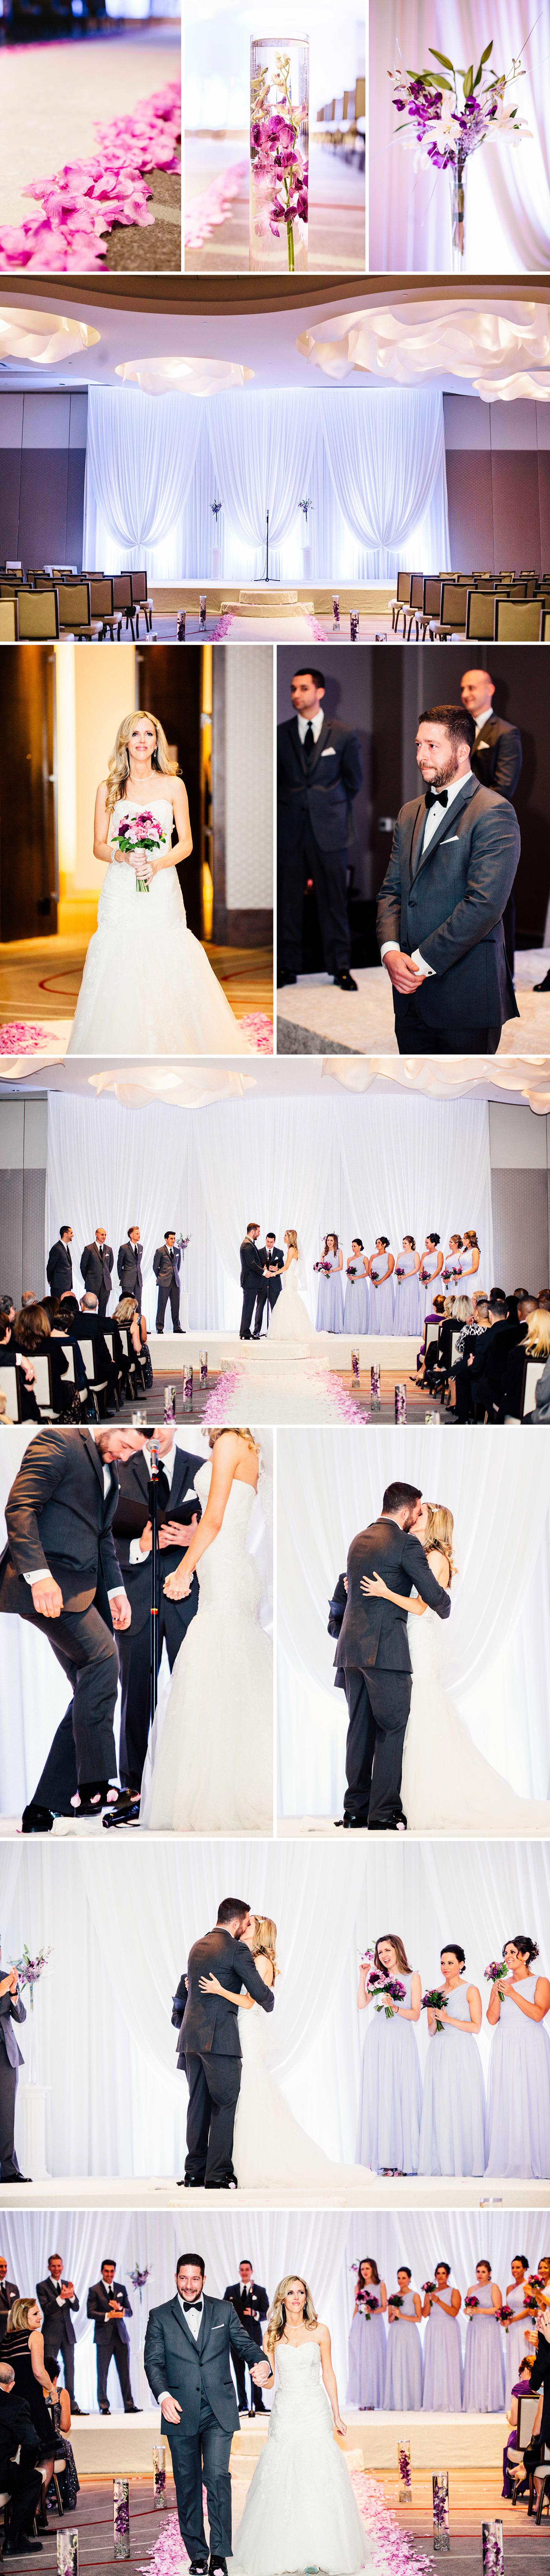 chicago-fine-art-wedding-photography-gorsky6